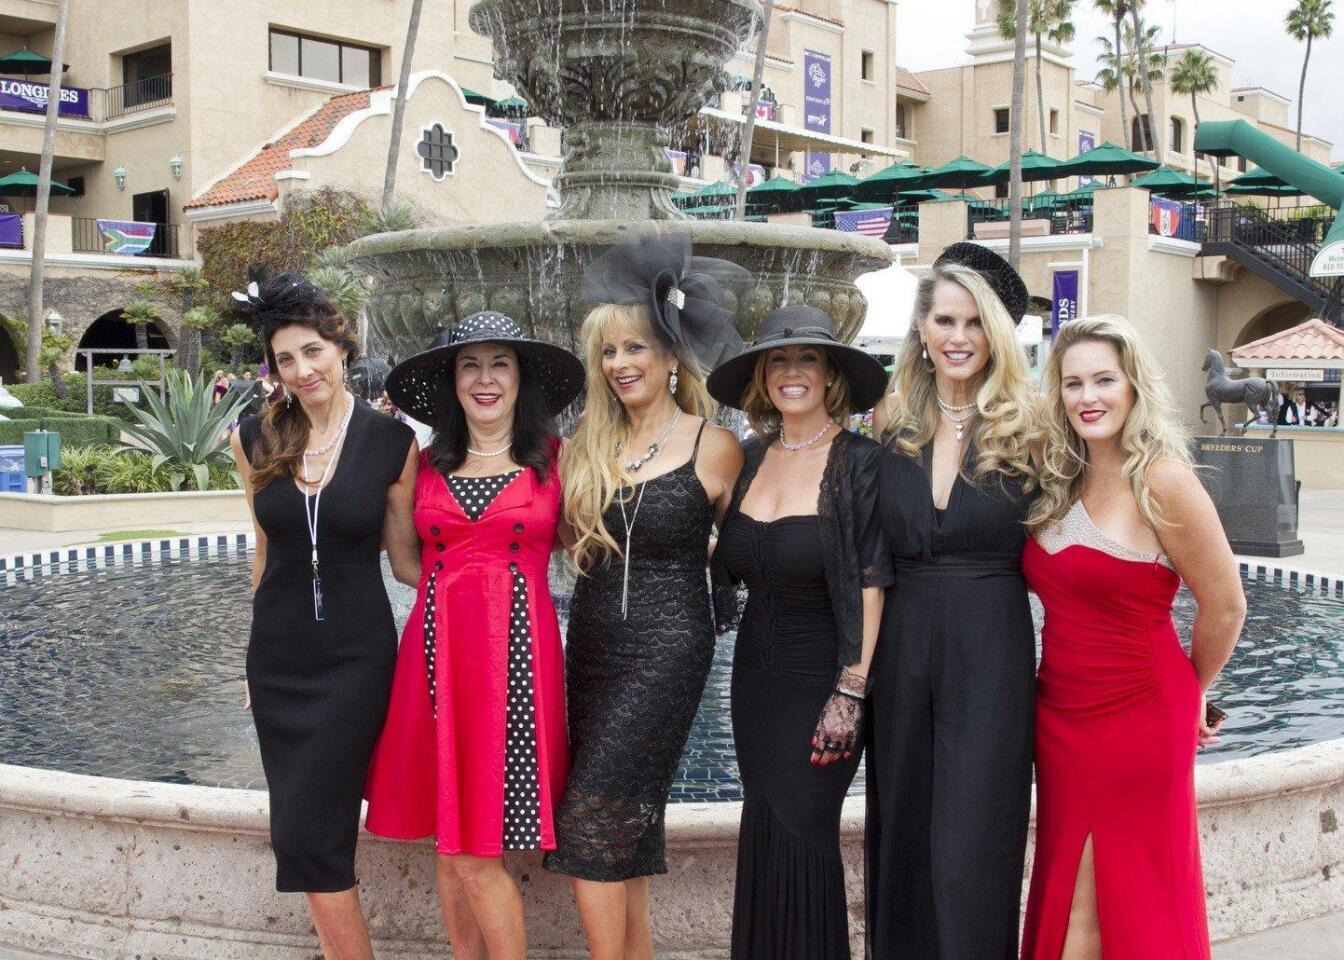 Linda Swindell, Christina Smith, Dr. Gigi Brentwood, Sara Sweet, Laura Paulson, Shana Pennington